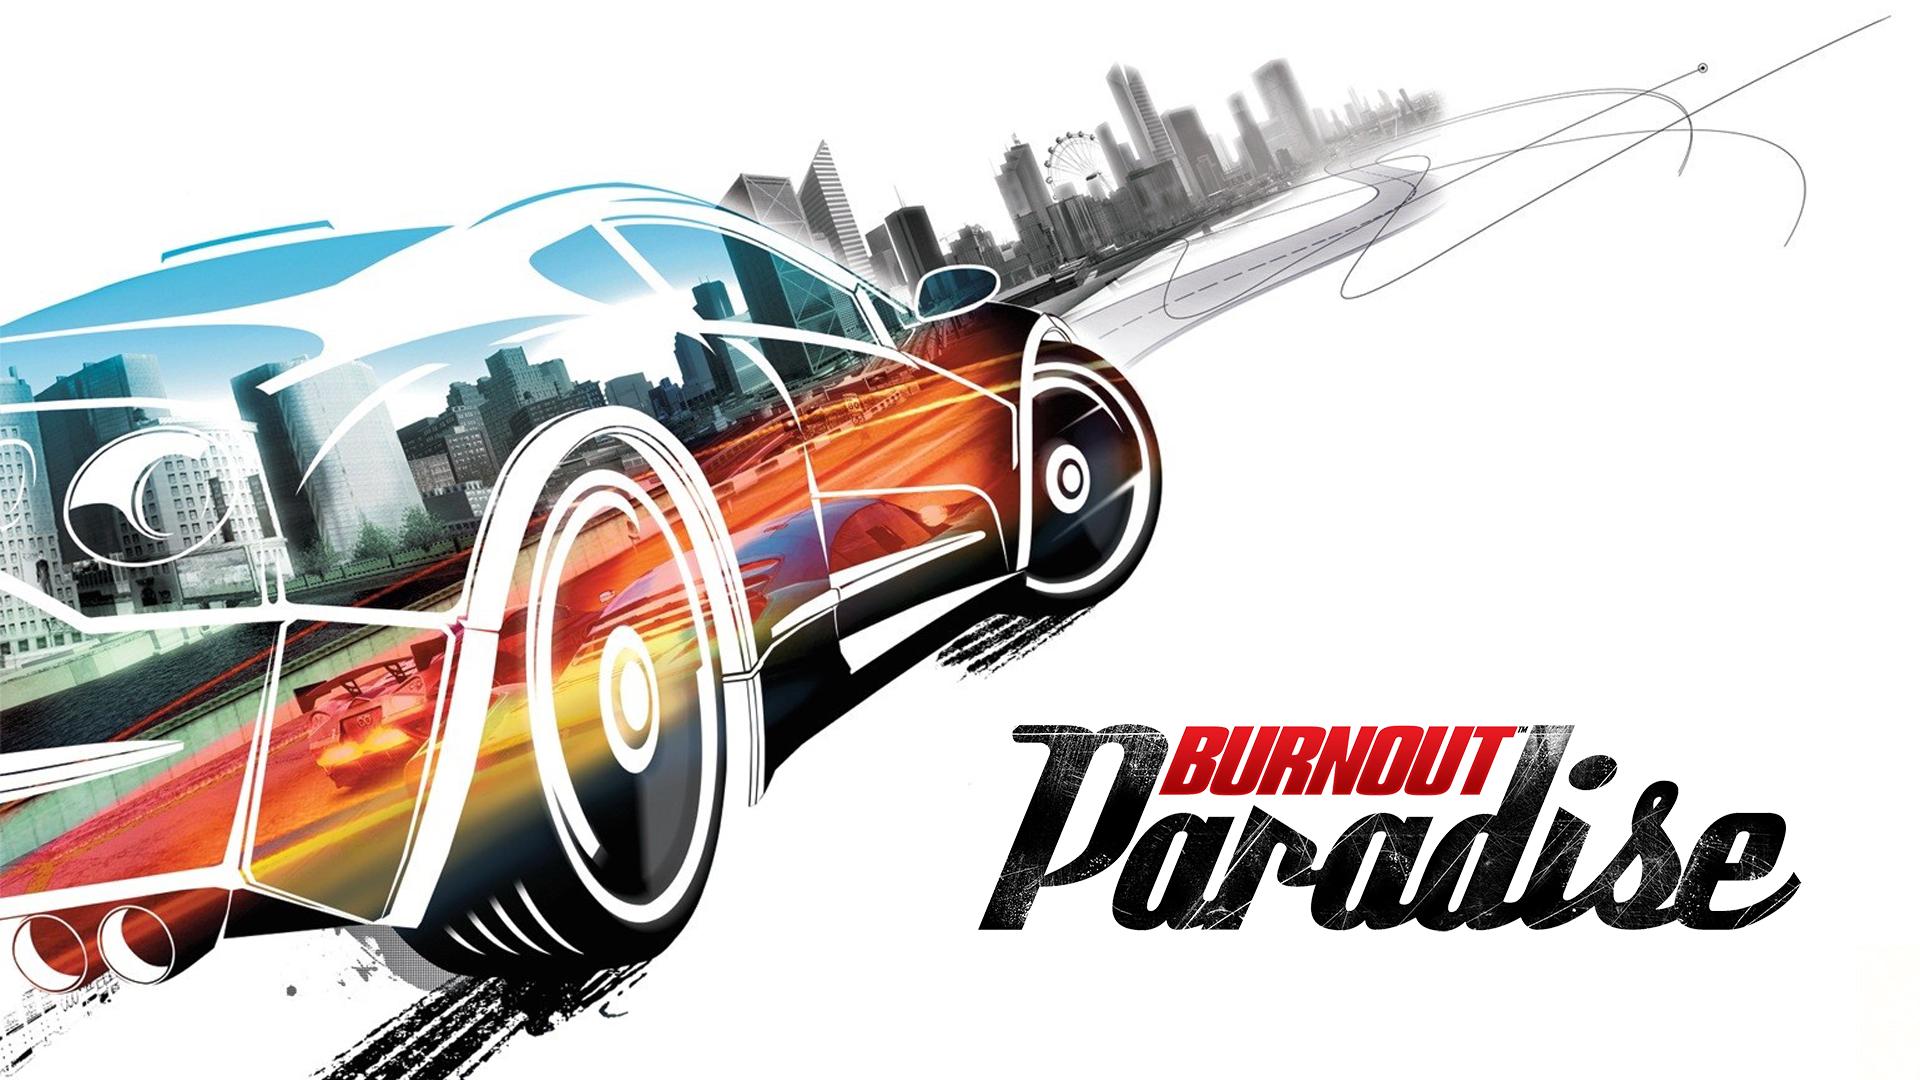 BurnoutParadise.png